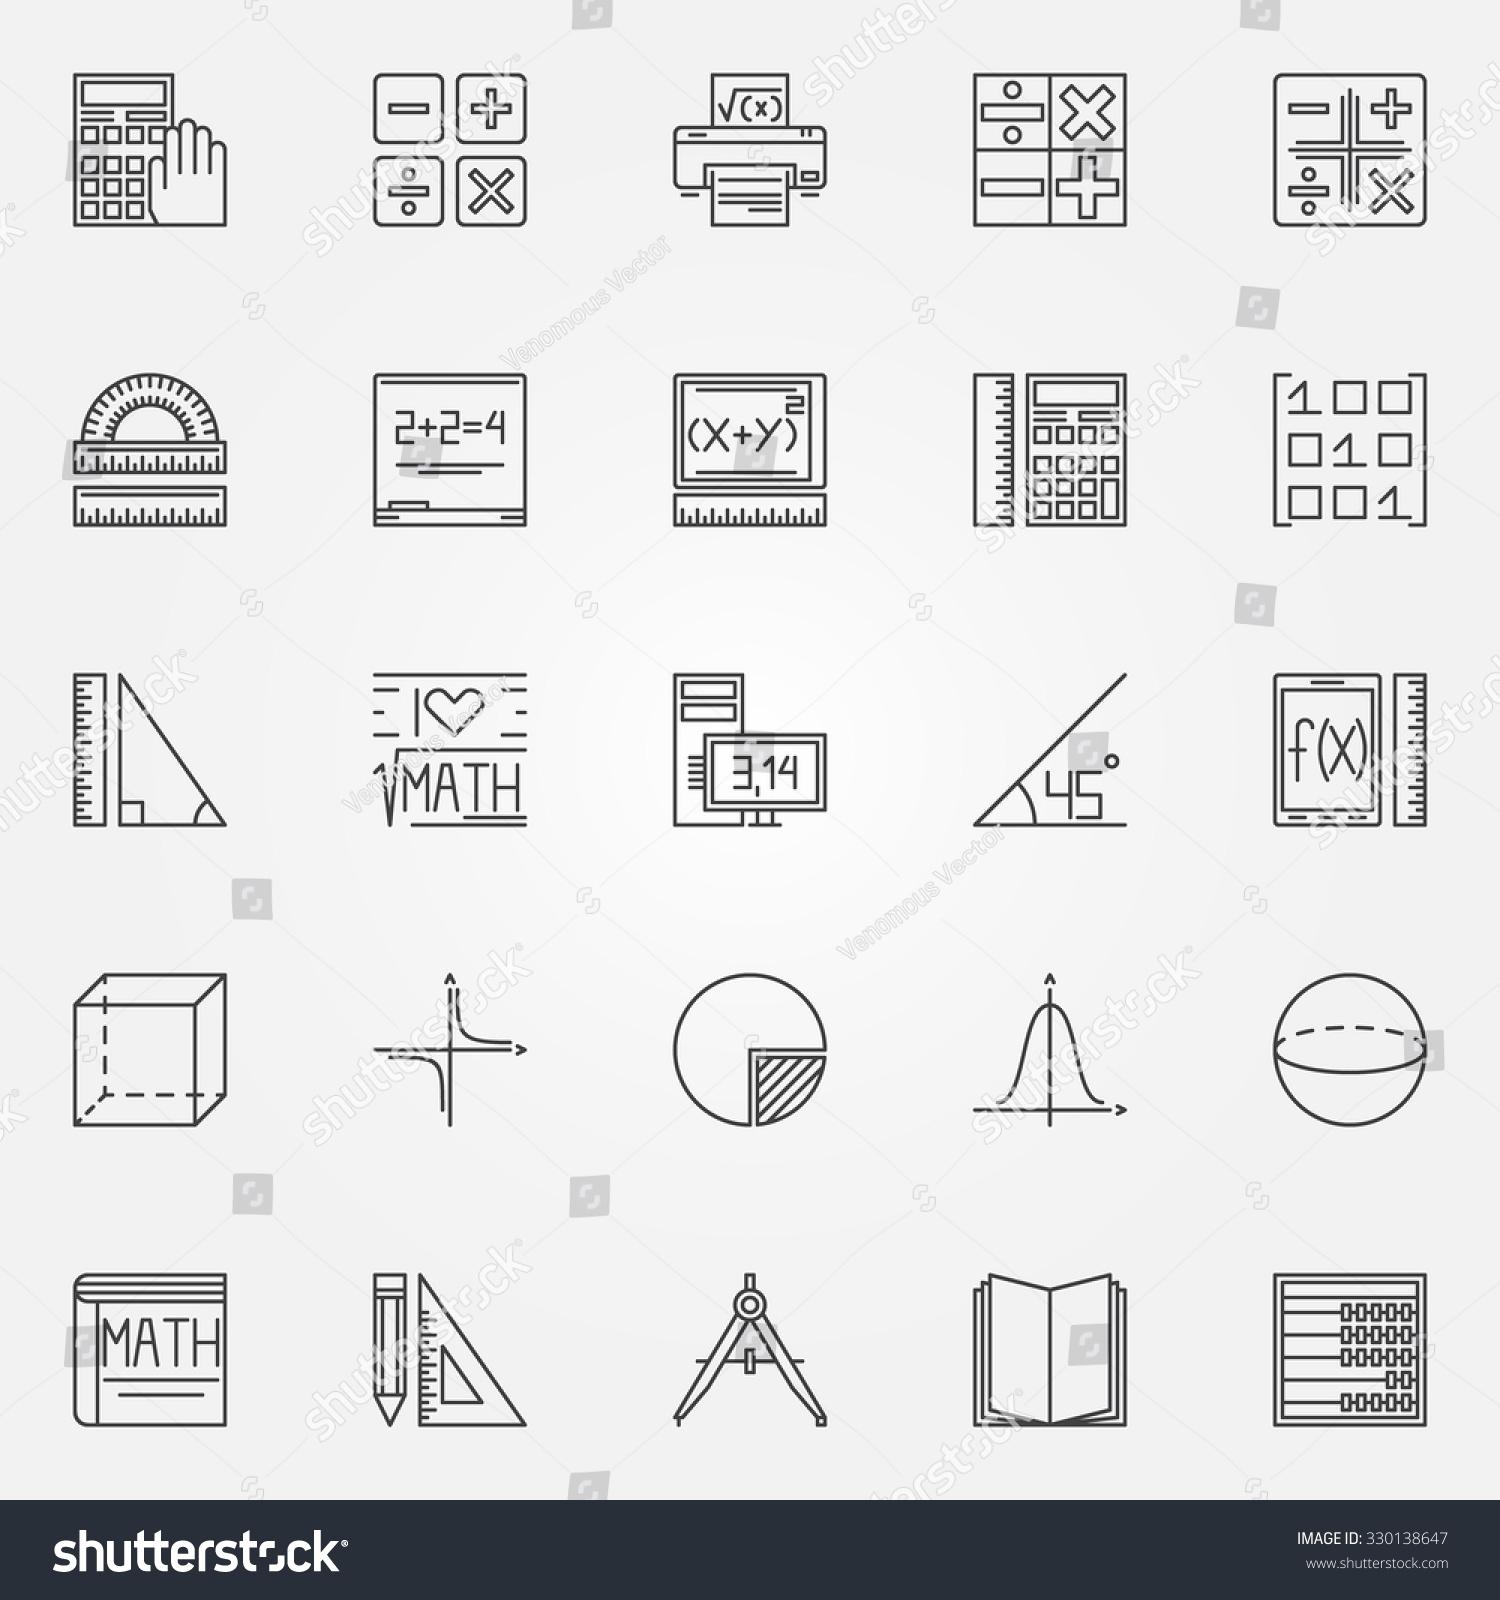 algebra math symbols printable chart math u003d love translating words into symbols coloring. Black Bedroom Furniture Sets. Home Design Ideas